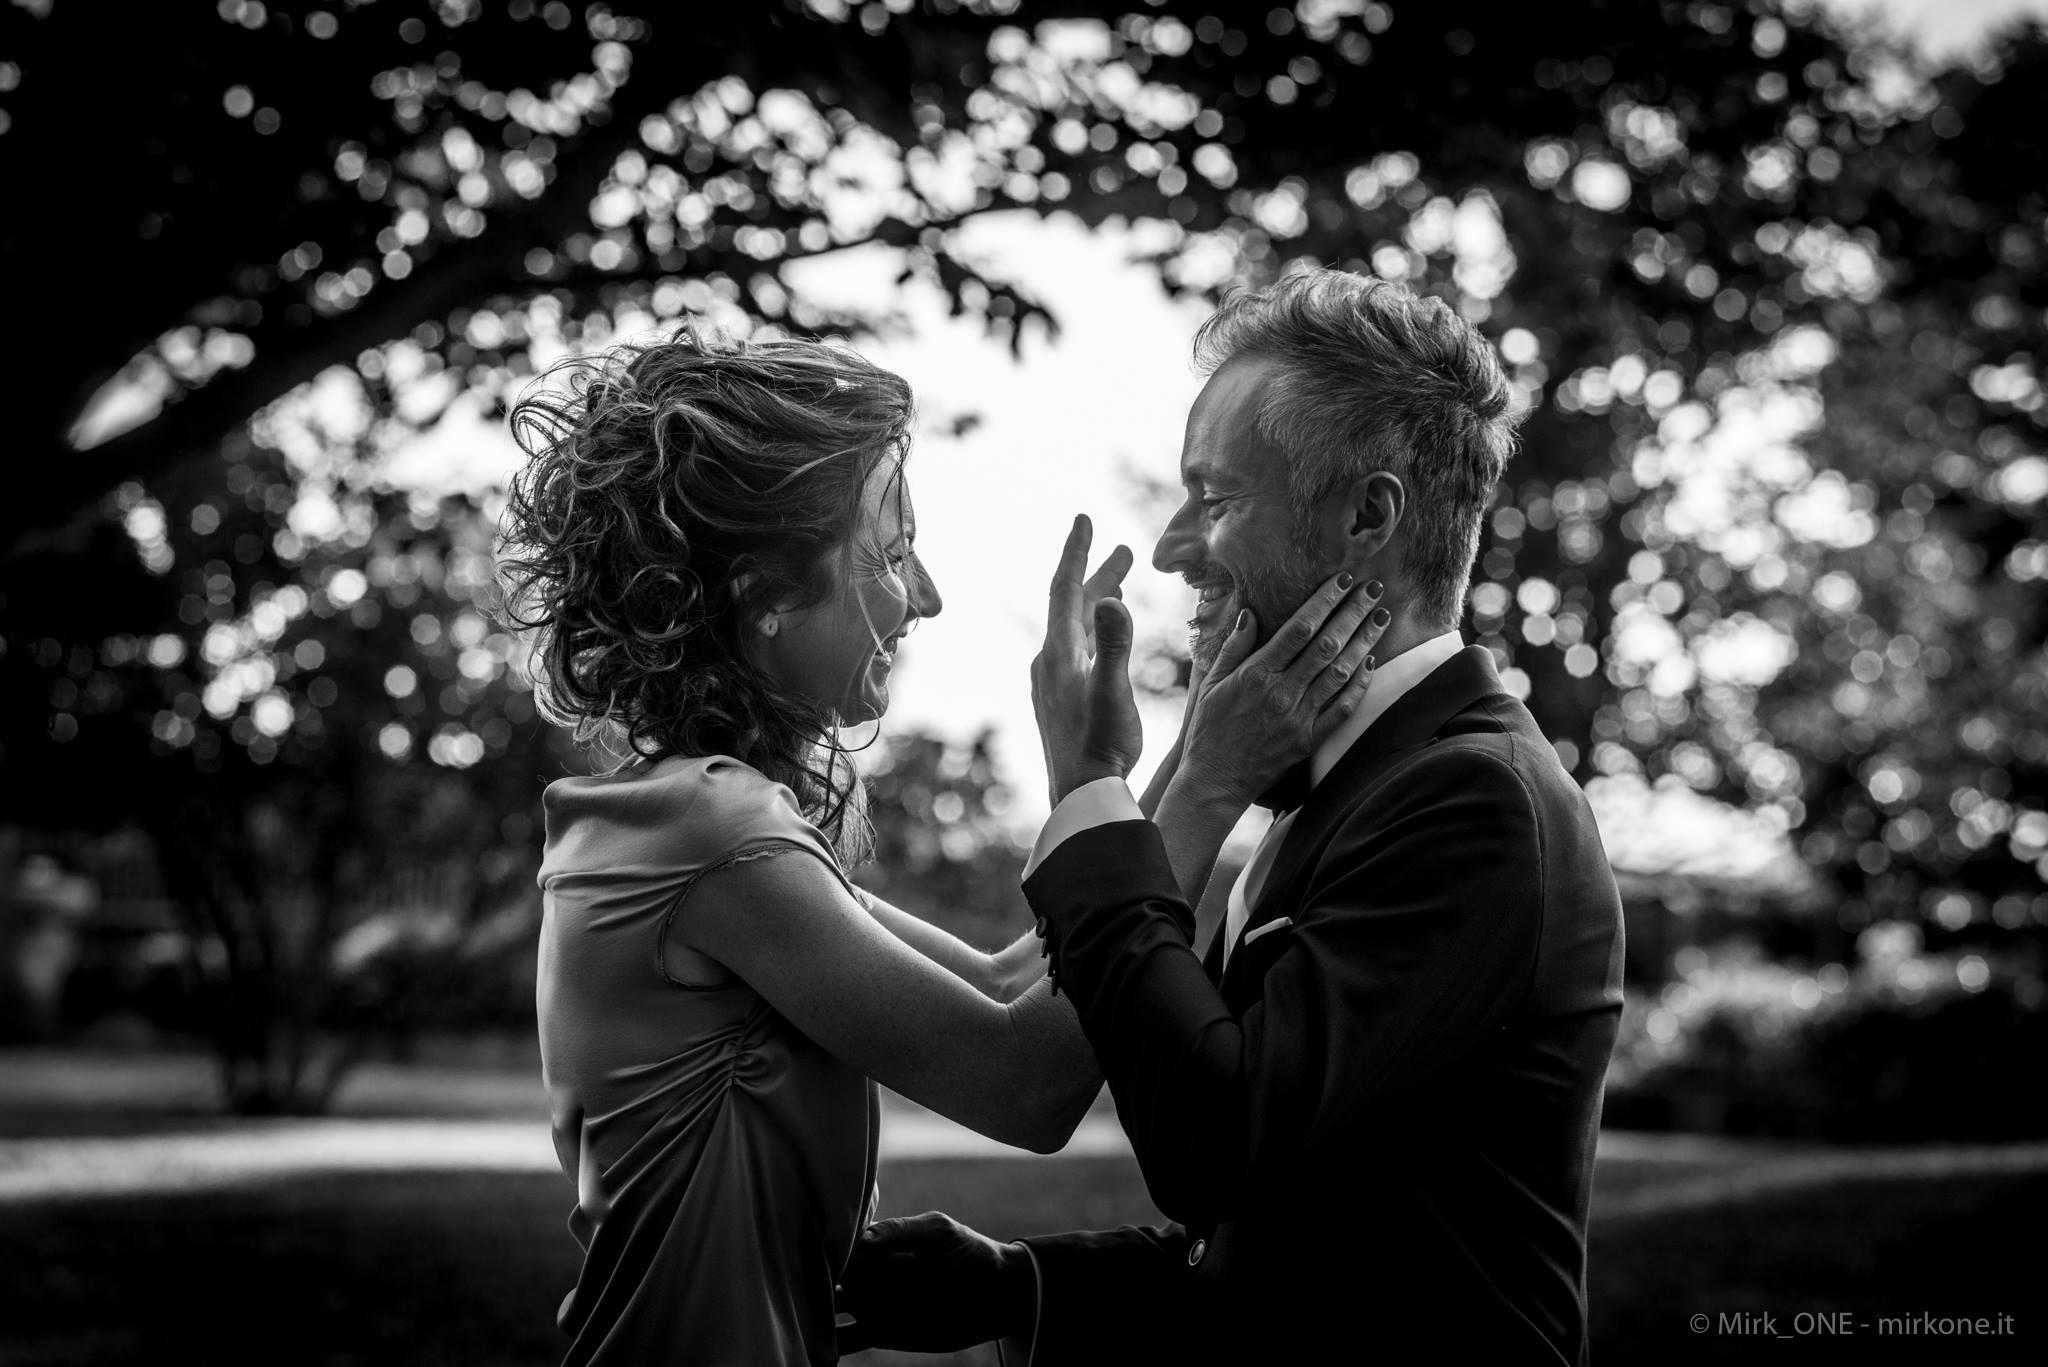 https://lnx.mirkone.it/wp-content/uploads/2015/07/mirk_ONE-fotografo-matrimonio-00102.jpg